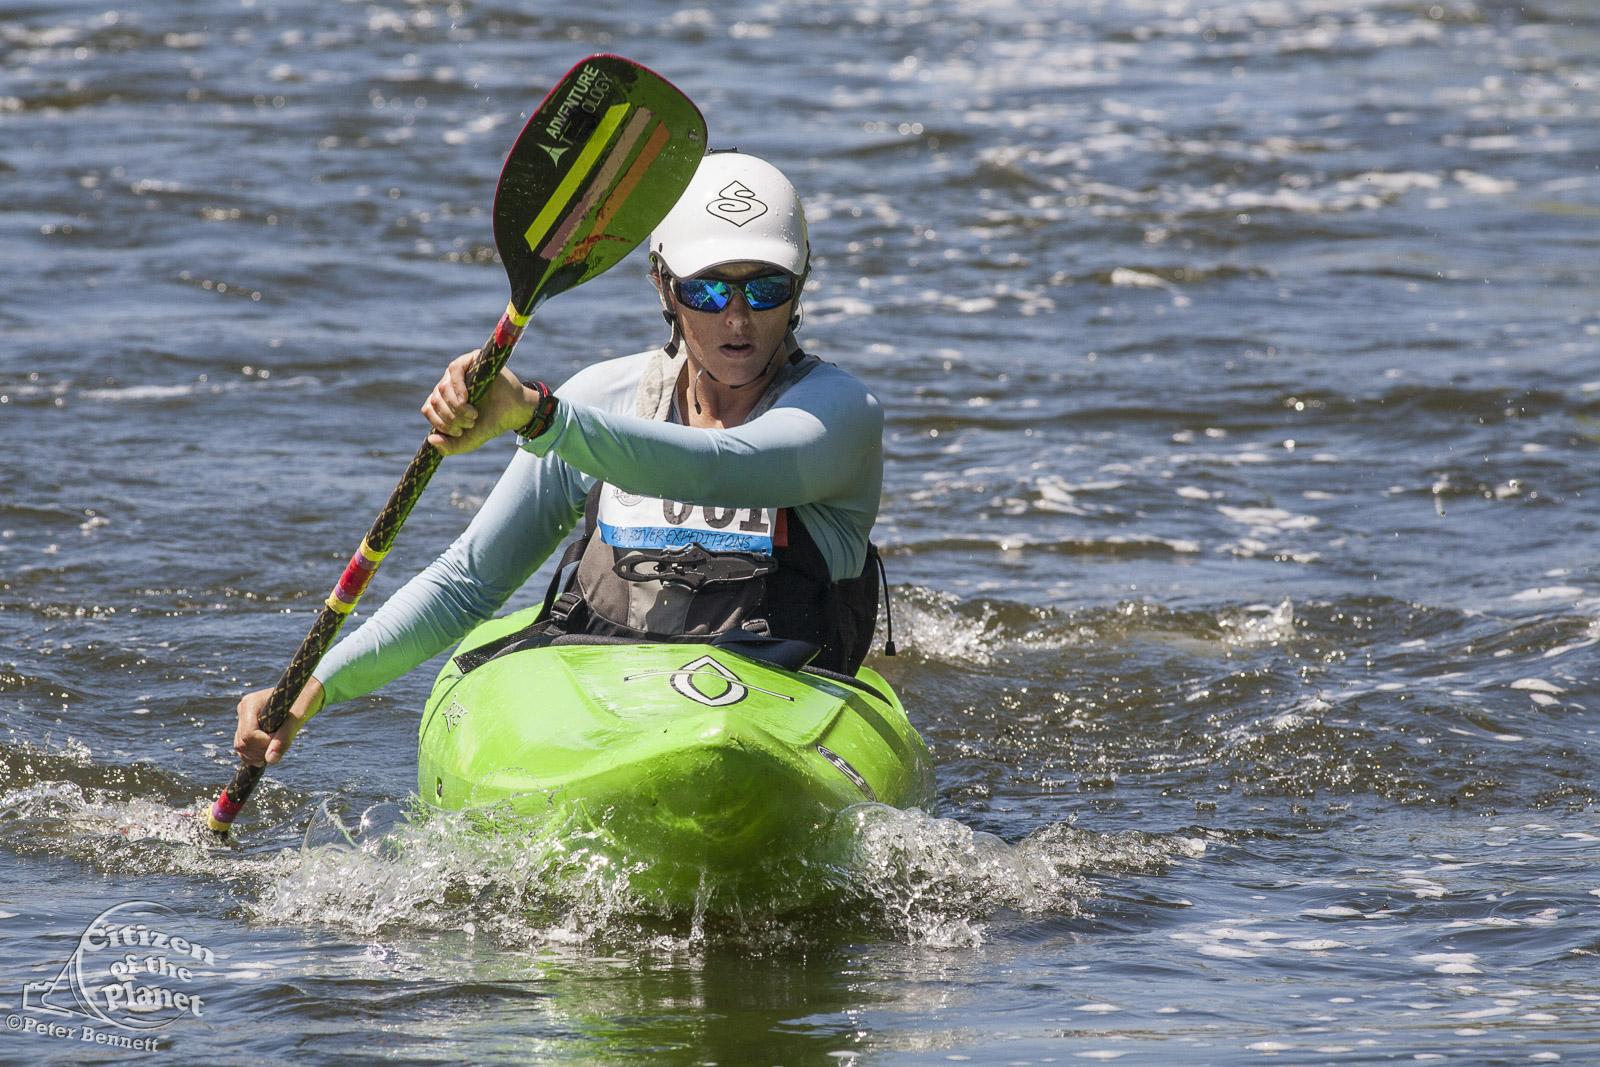 US_CA_48_3848_la_river_boat_race.jpg